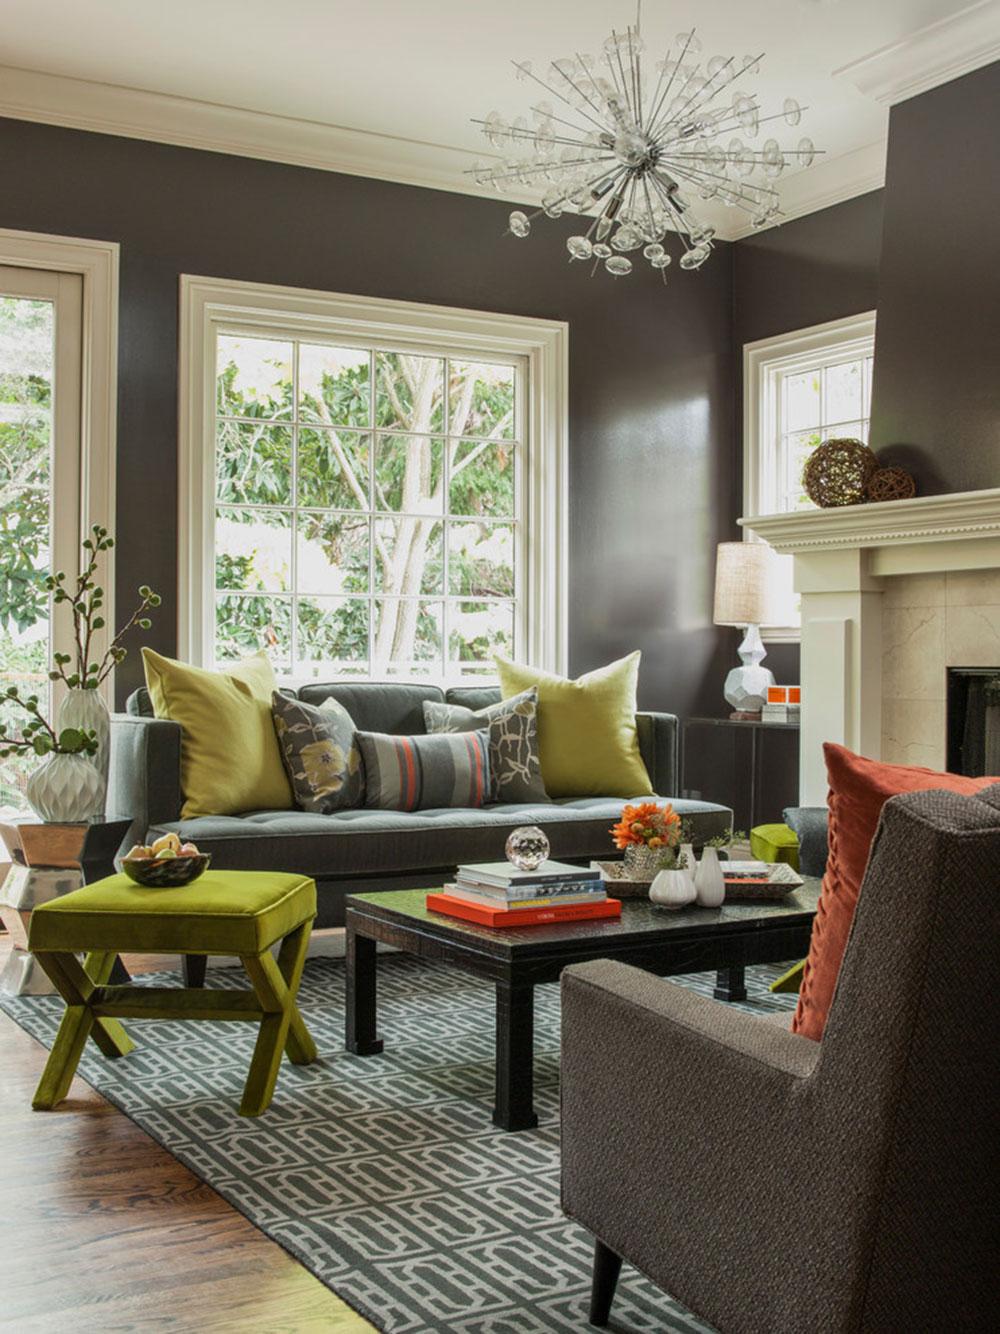 Amaizing-Living-Room-Paint-Colors1 Fantastiska Living Room Paint Colors